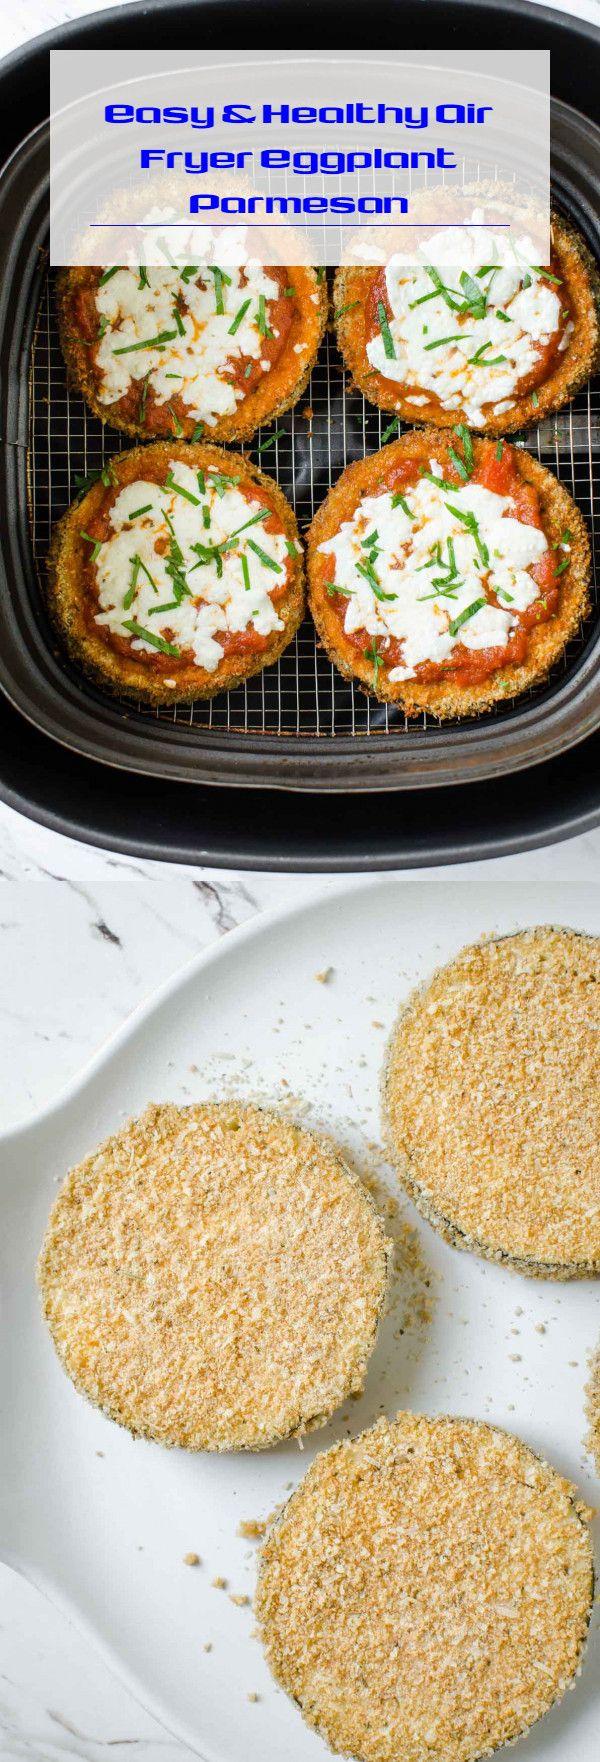 Easy & Healthy Air Fryer Eggplant Parmesan Air fryer